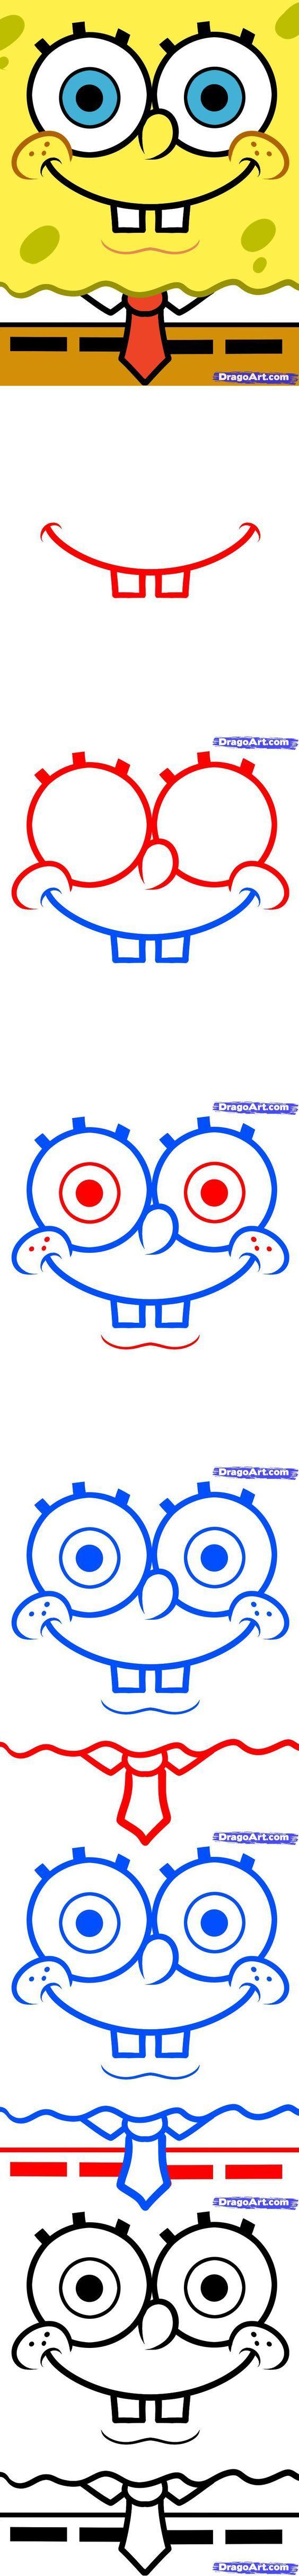 How to Draw Spongebob Easy | Spongebob drawings, Spongebob ...